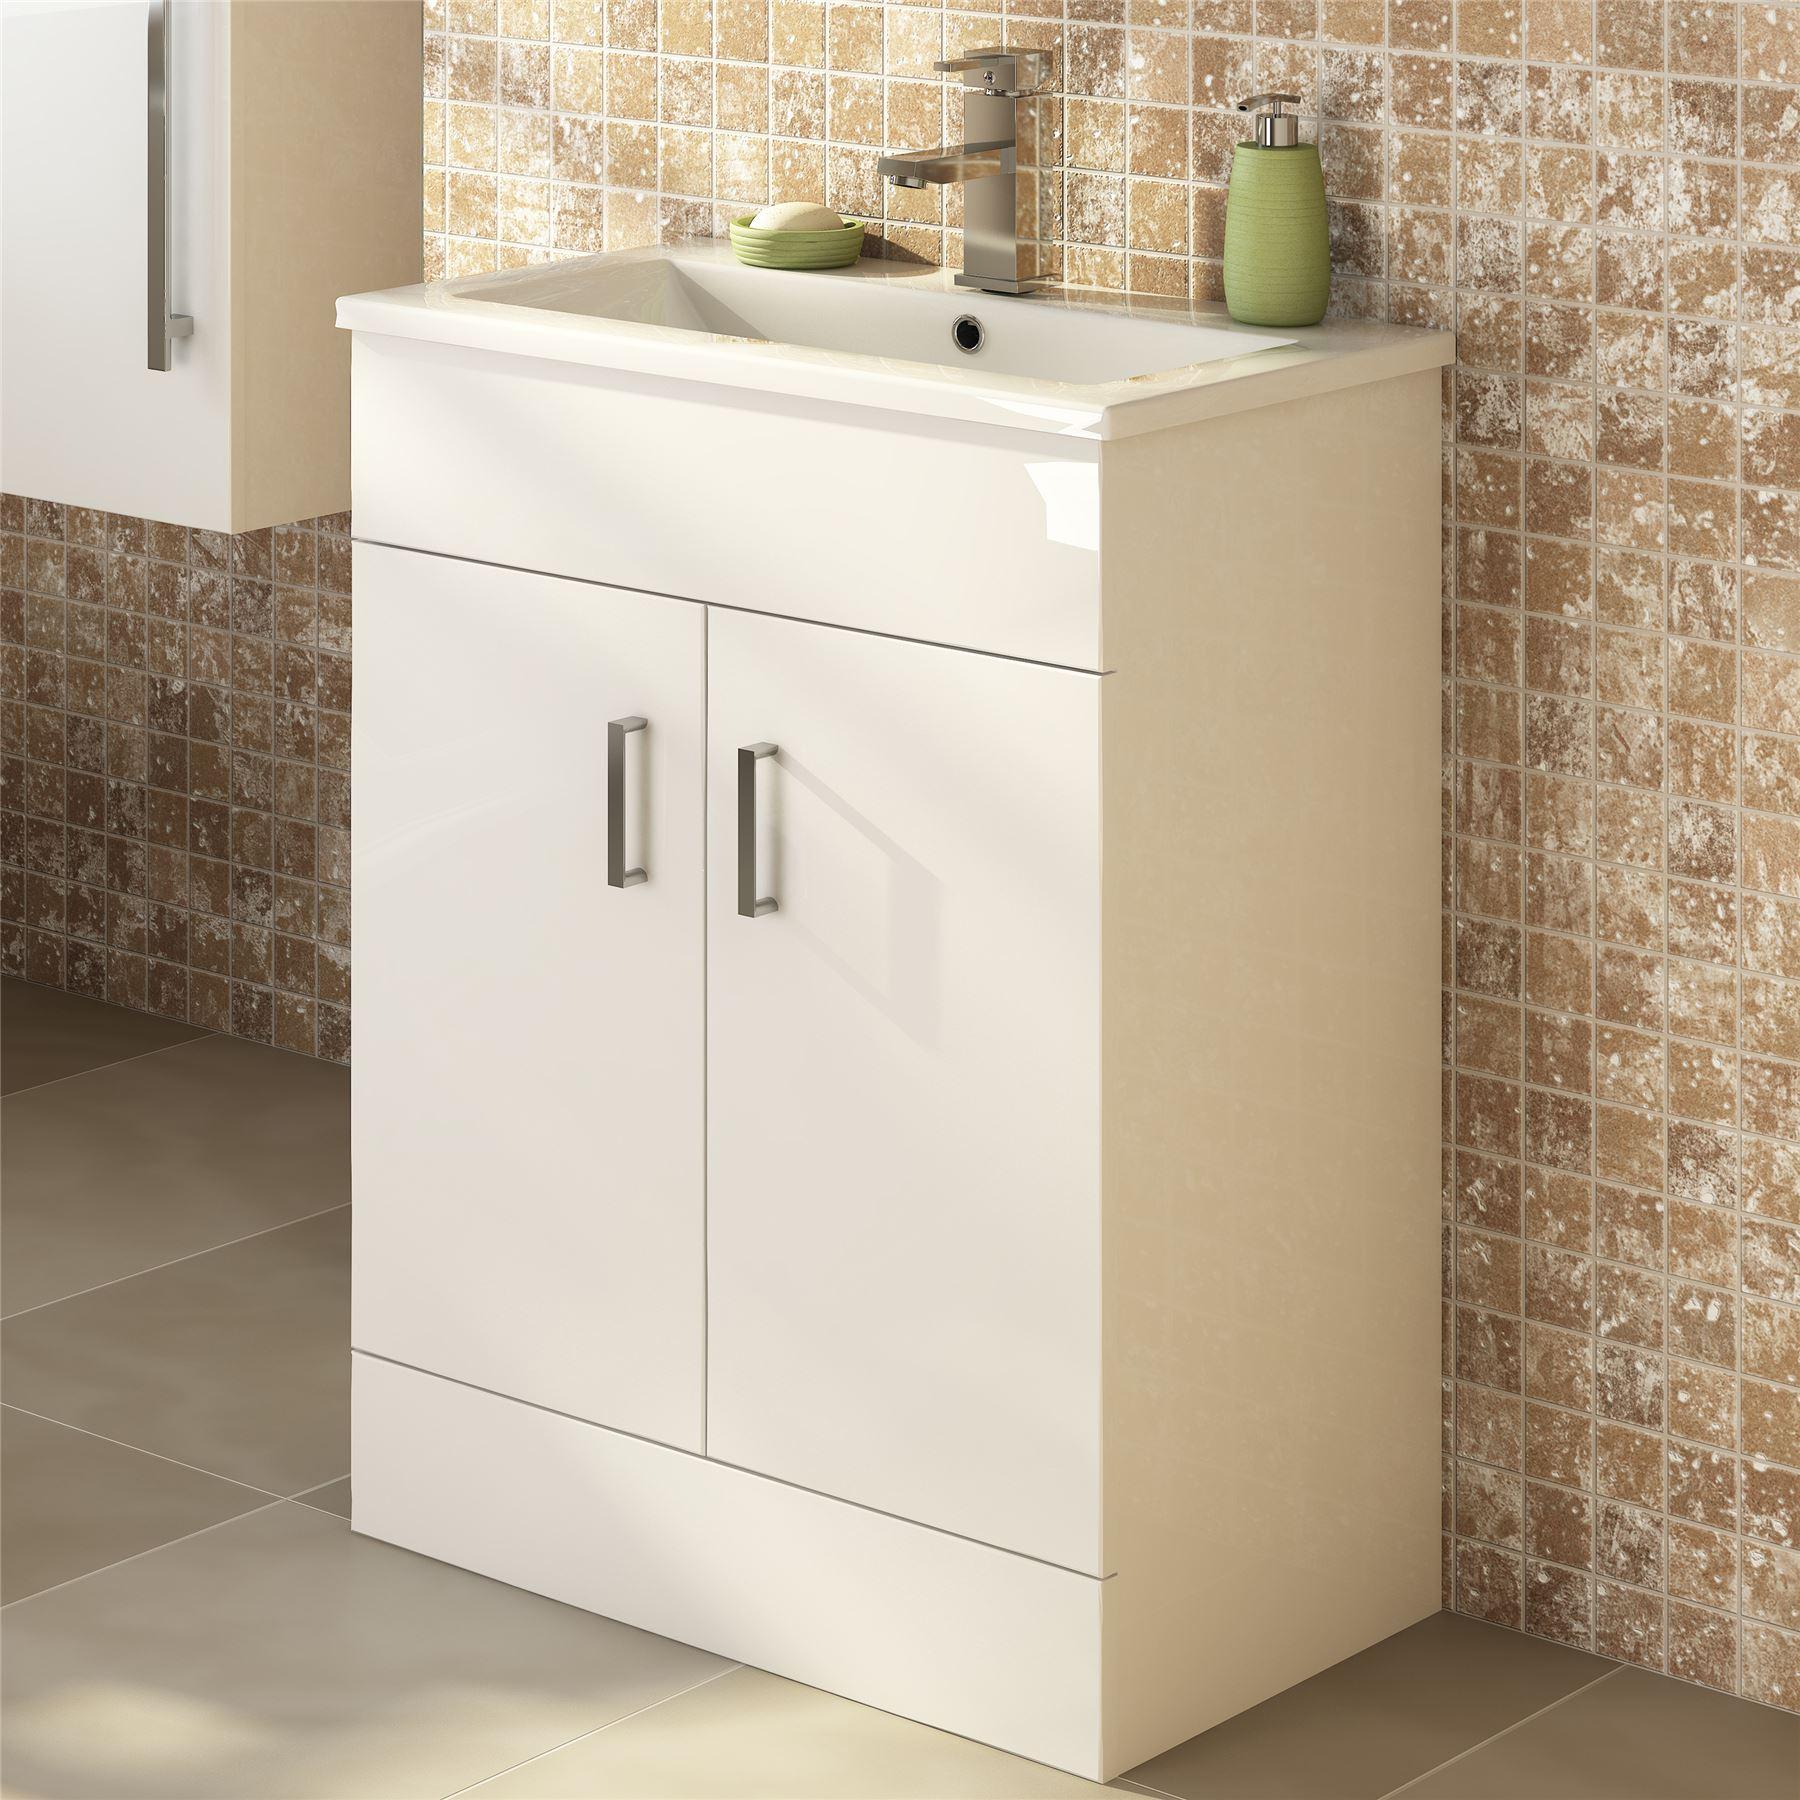 450mm Modern White Bathroom Floor Standing Vanity Unit